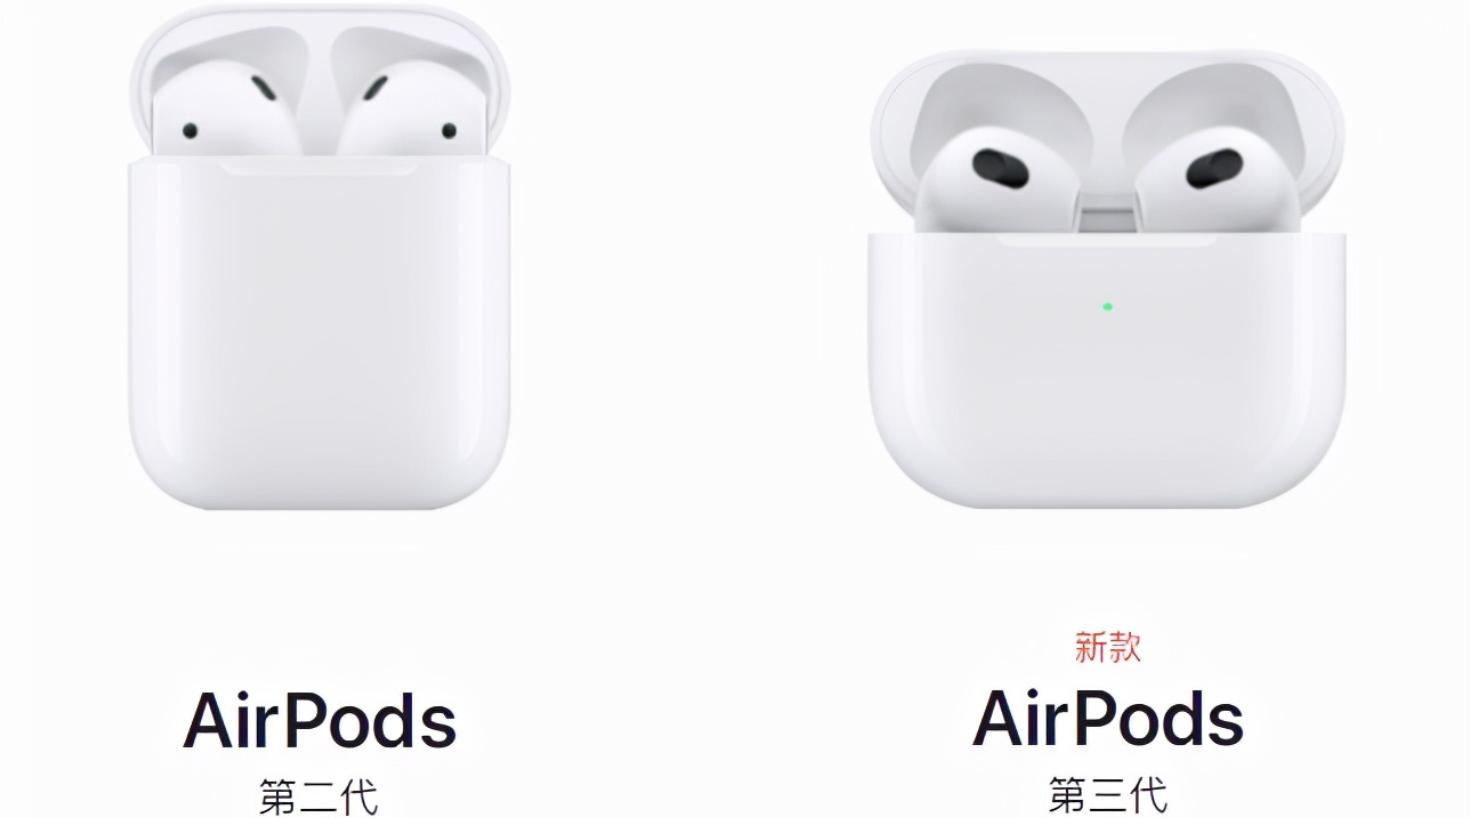 airpods 3和2 有什么区别_airpods3和2盒子有区别吗